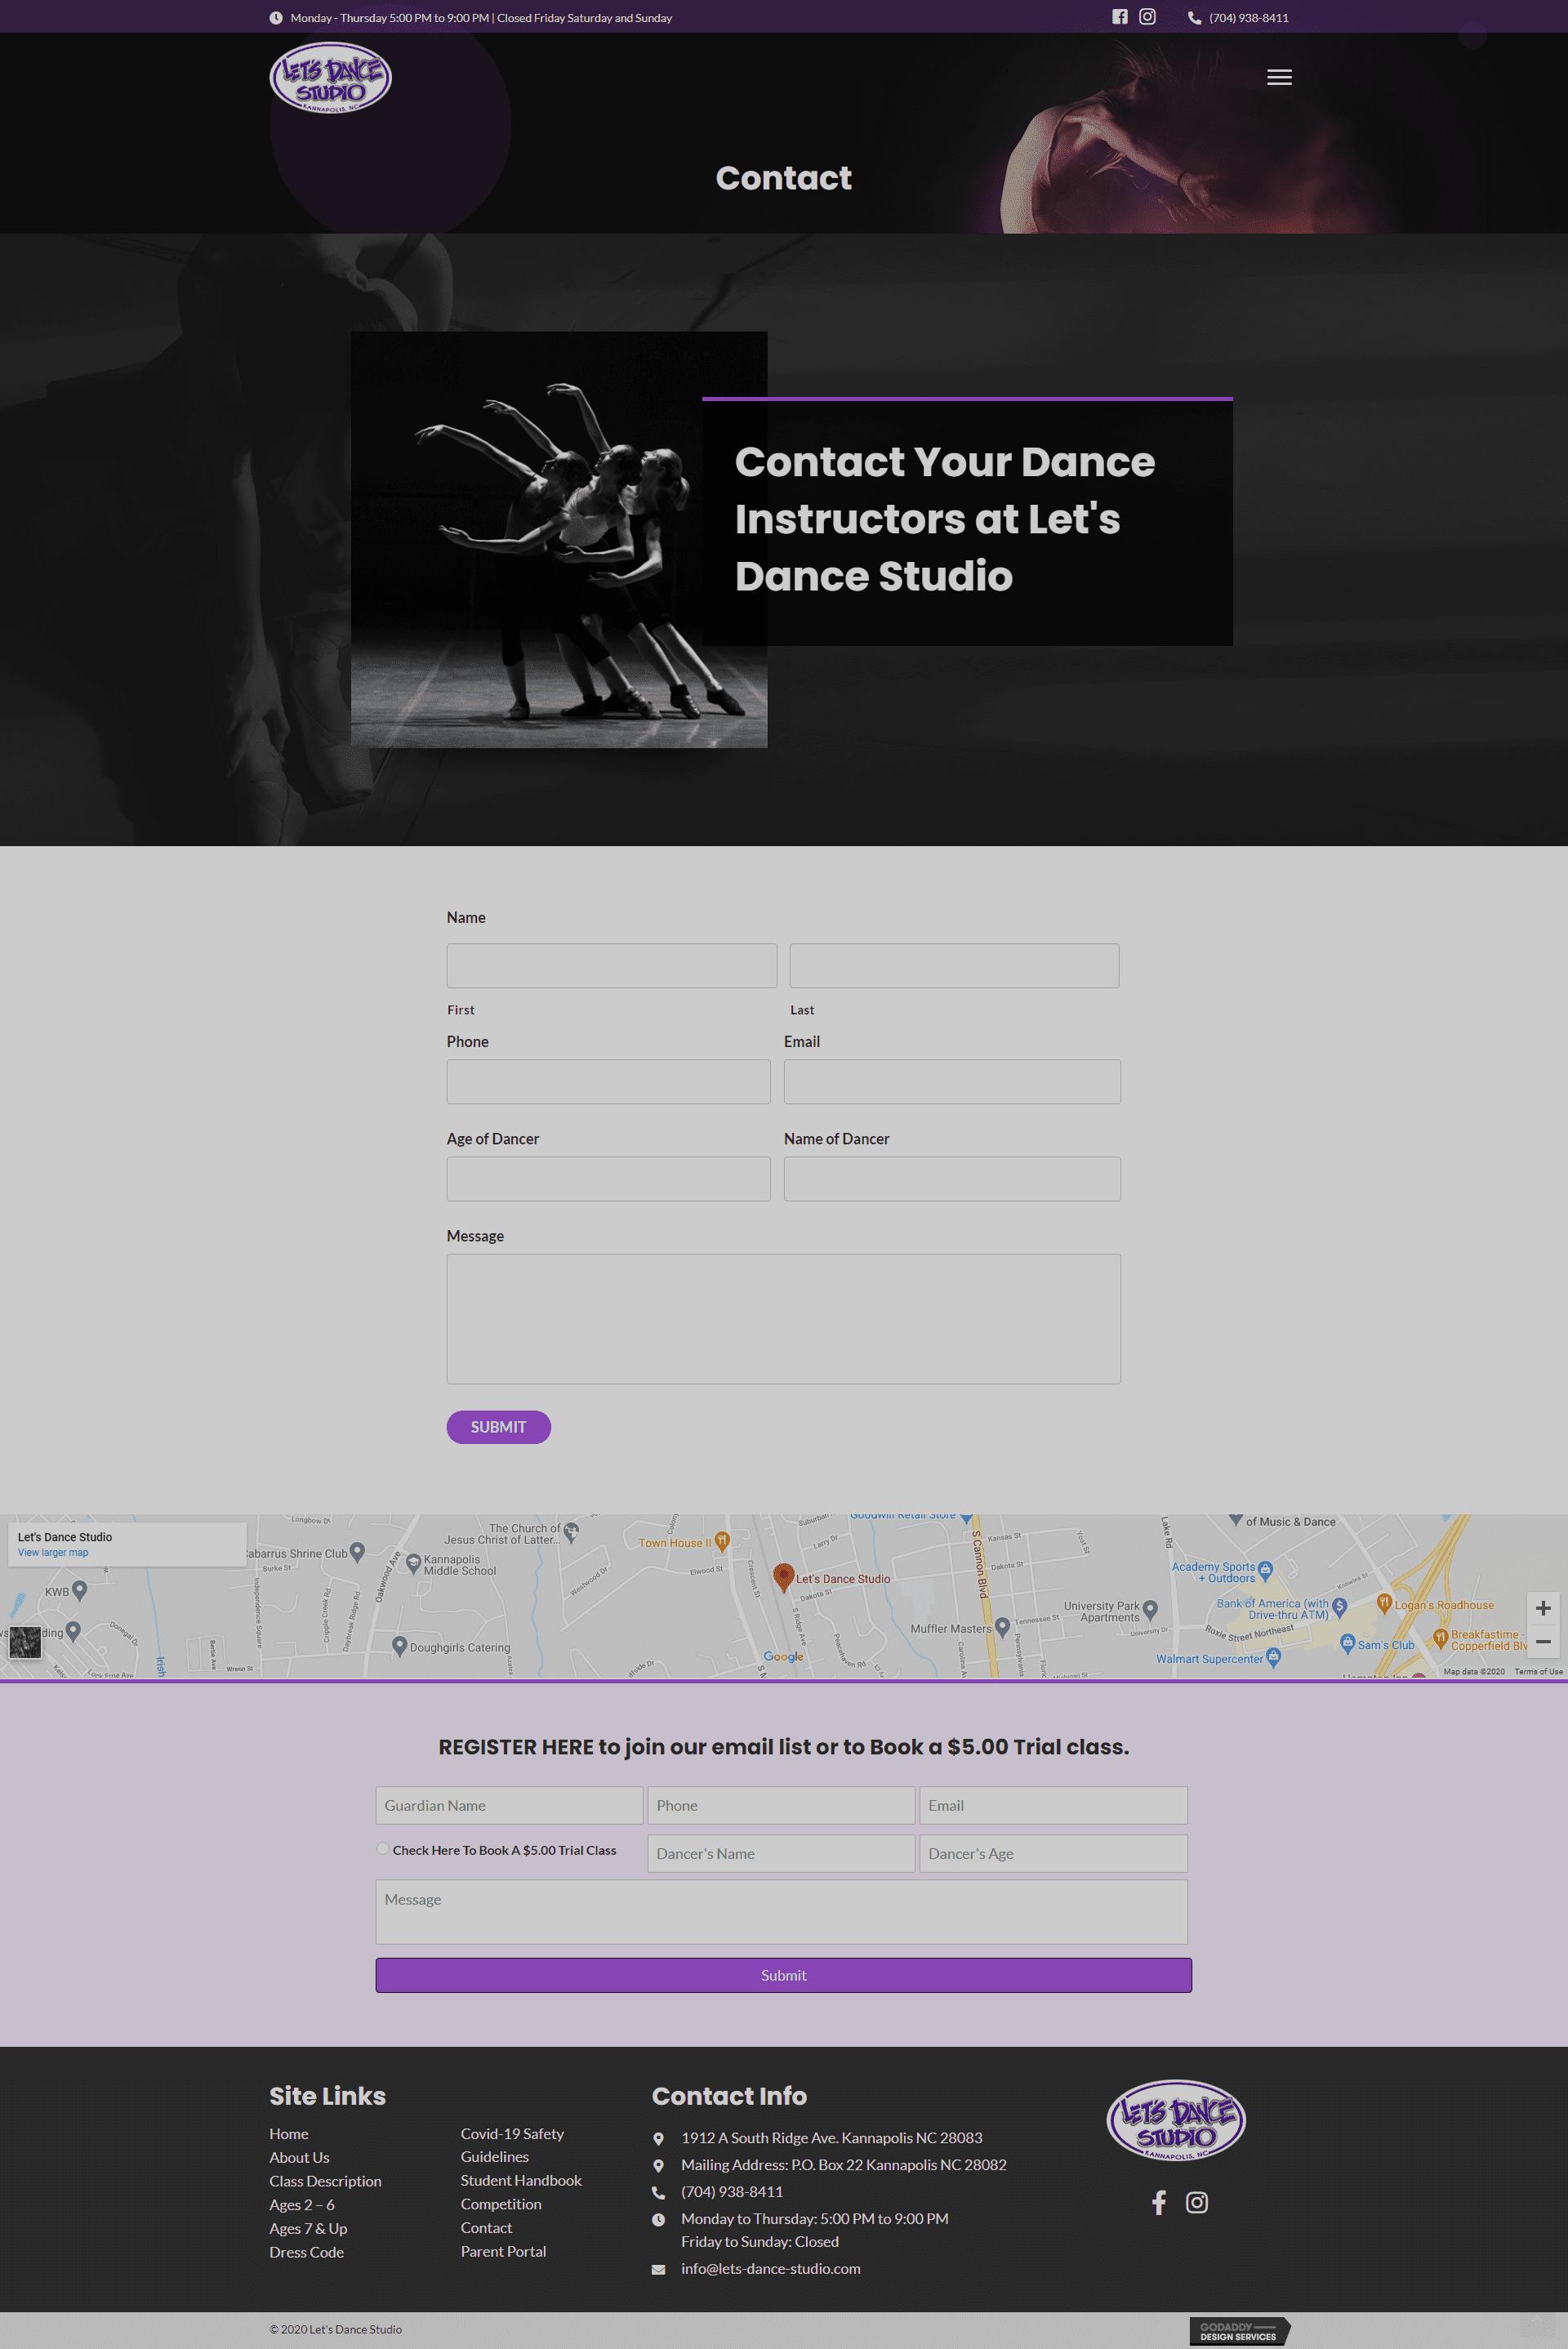 Let's Dance Studio Contact Page